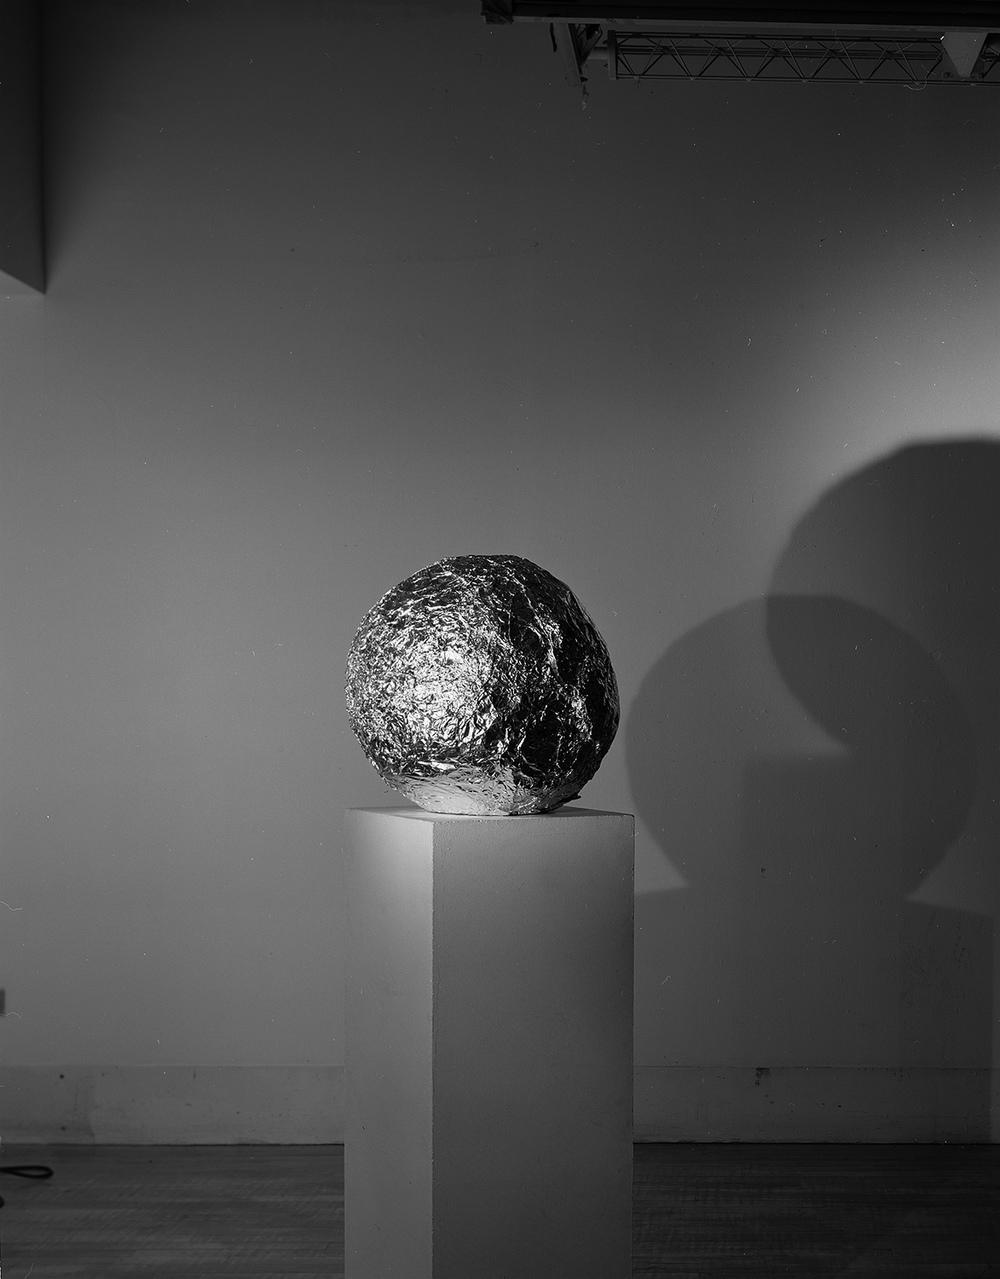 tinfoil_ball_3_lo_op.jpg